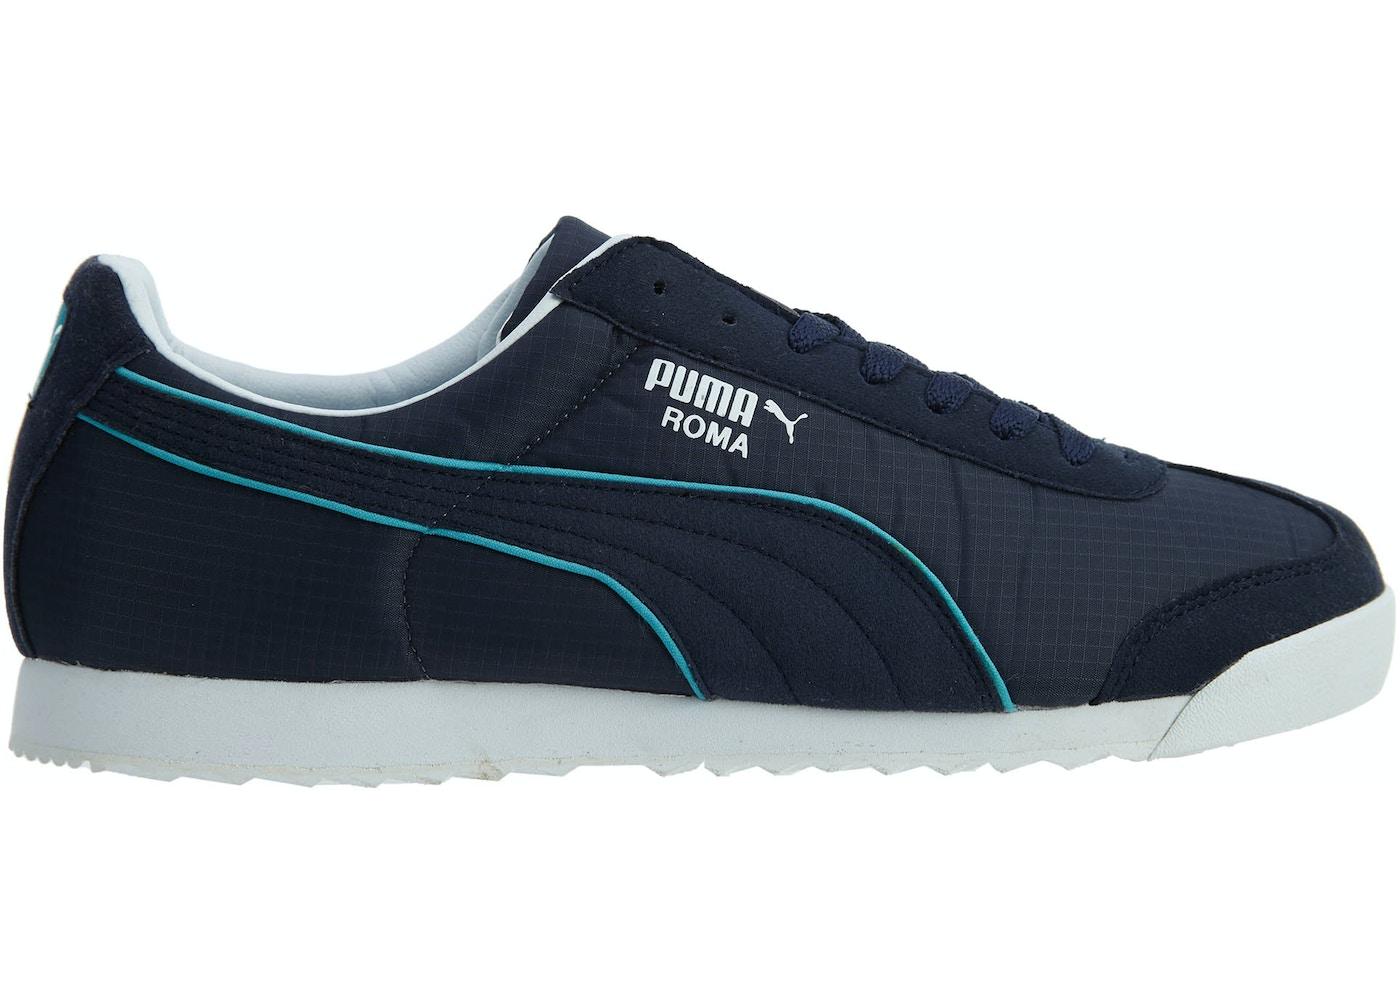 buy popular 36dfe 268dd Puma Size 10 Shoes - Lowest Ask